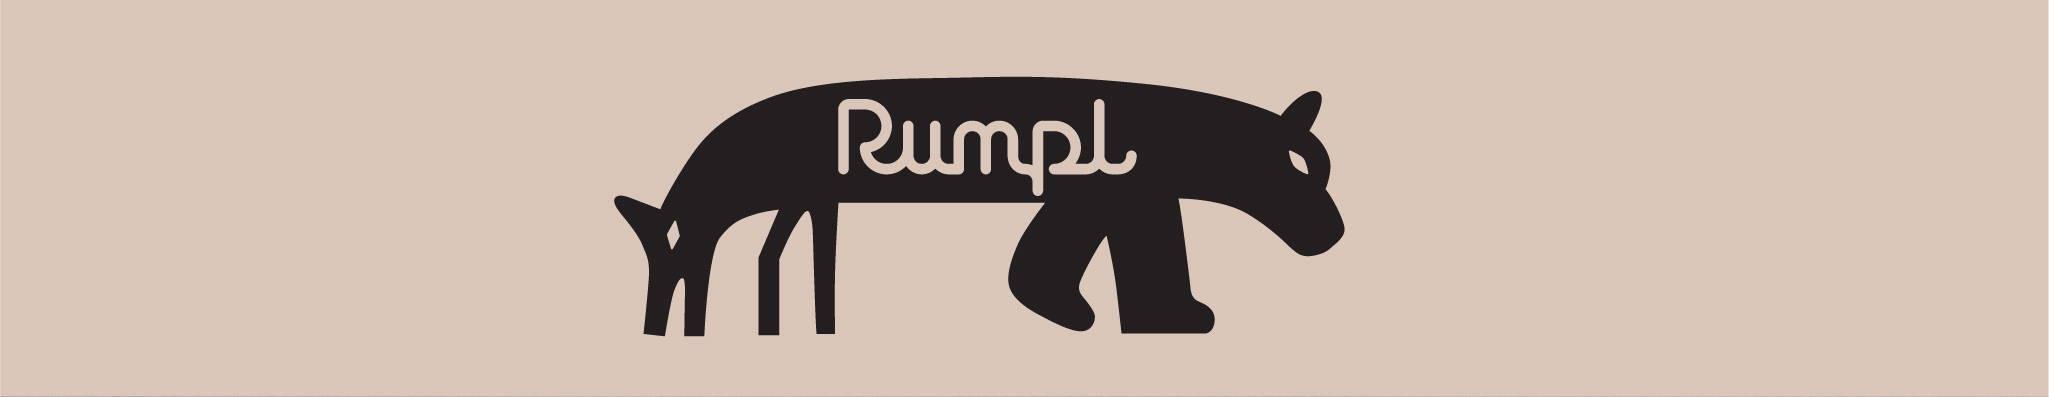 Rumpl Westerlind fox bear logo